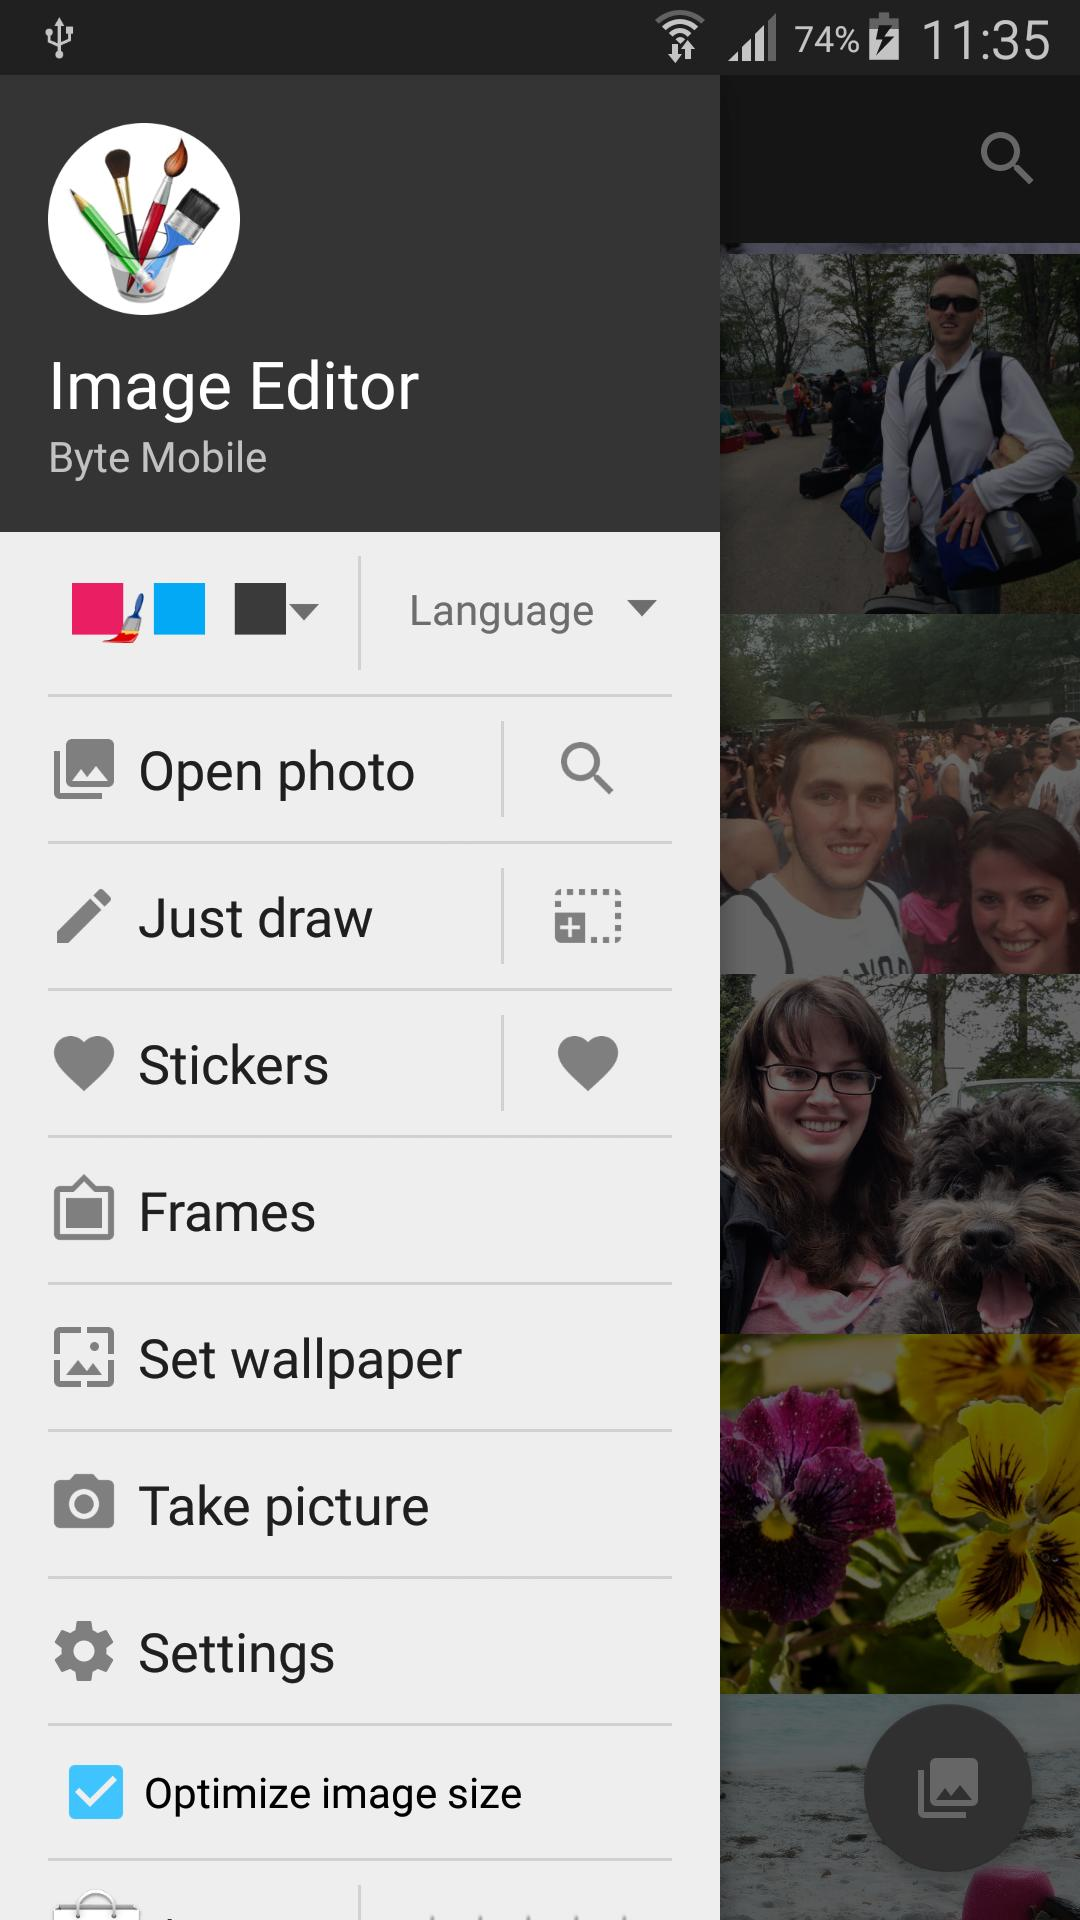 Image-Editor-Byte-Mobile